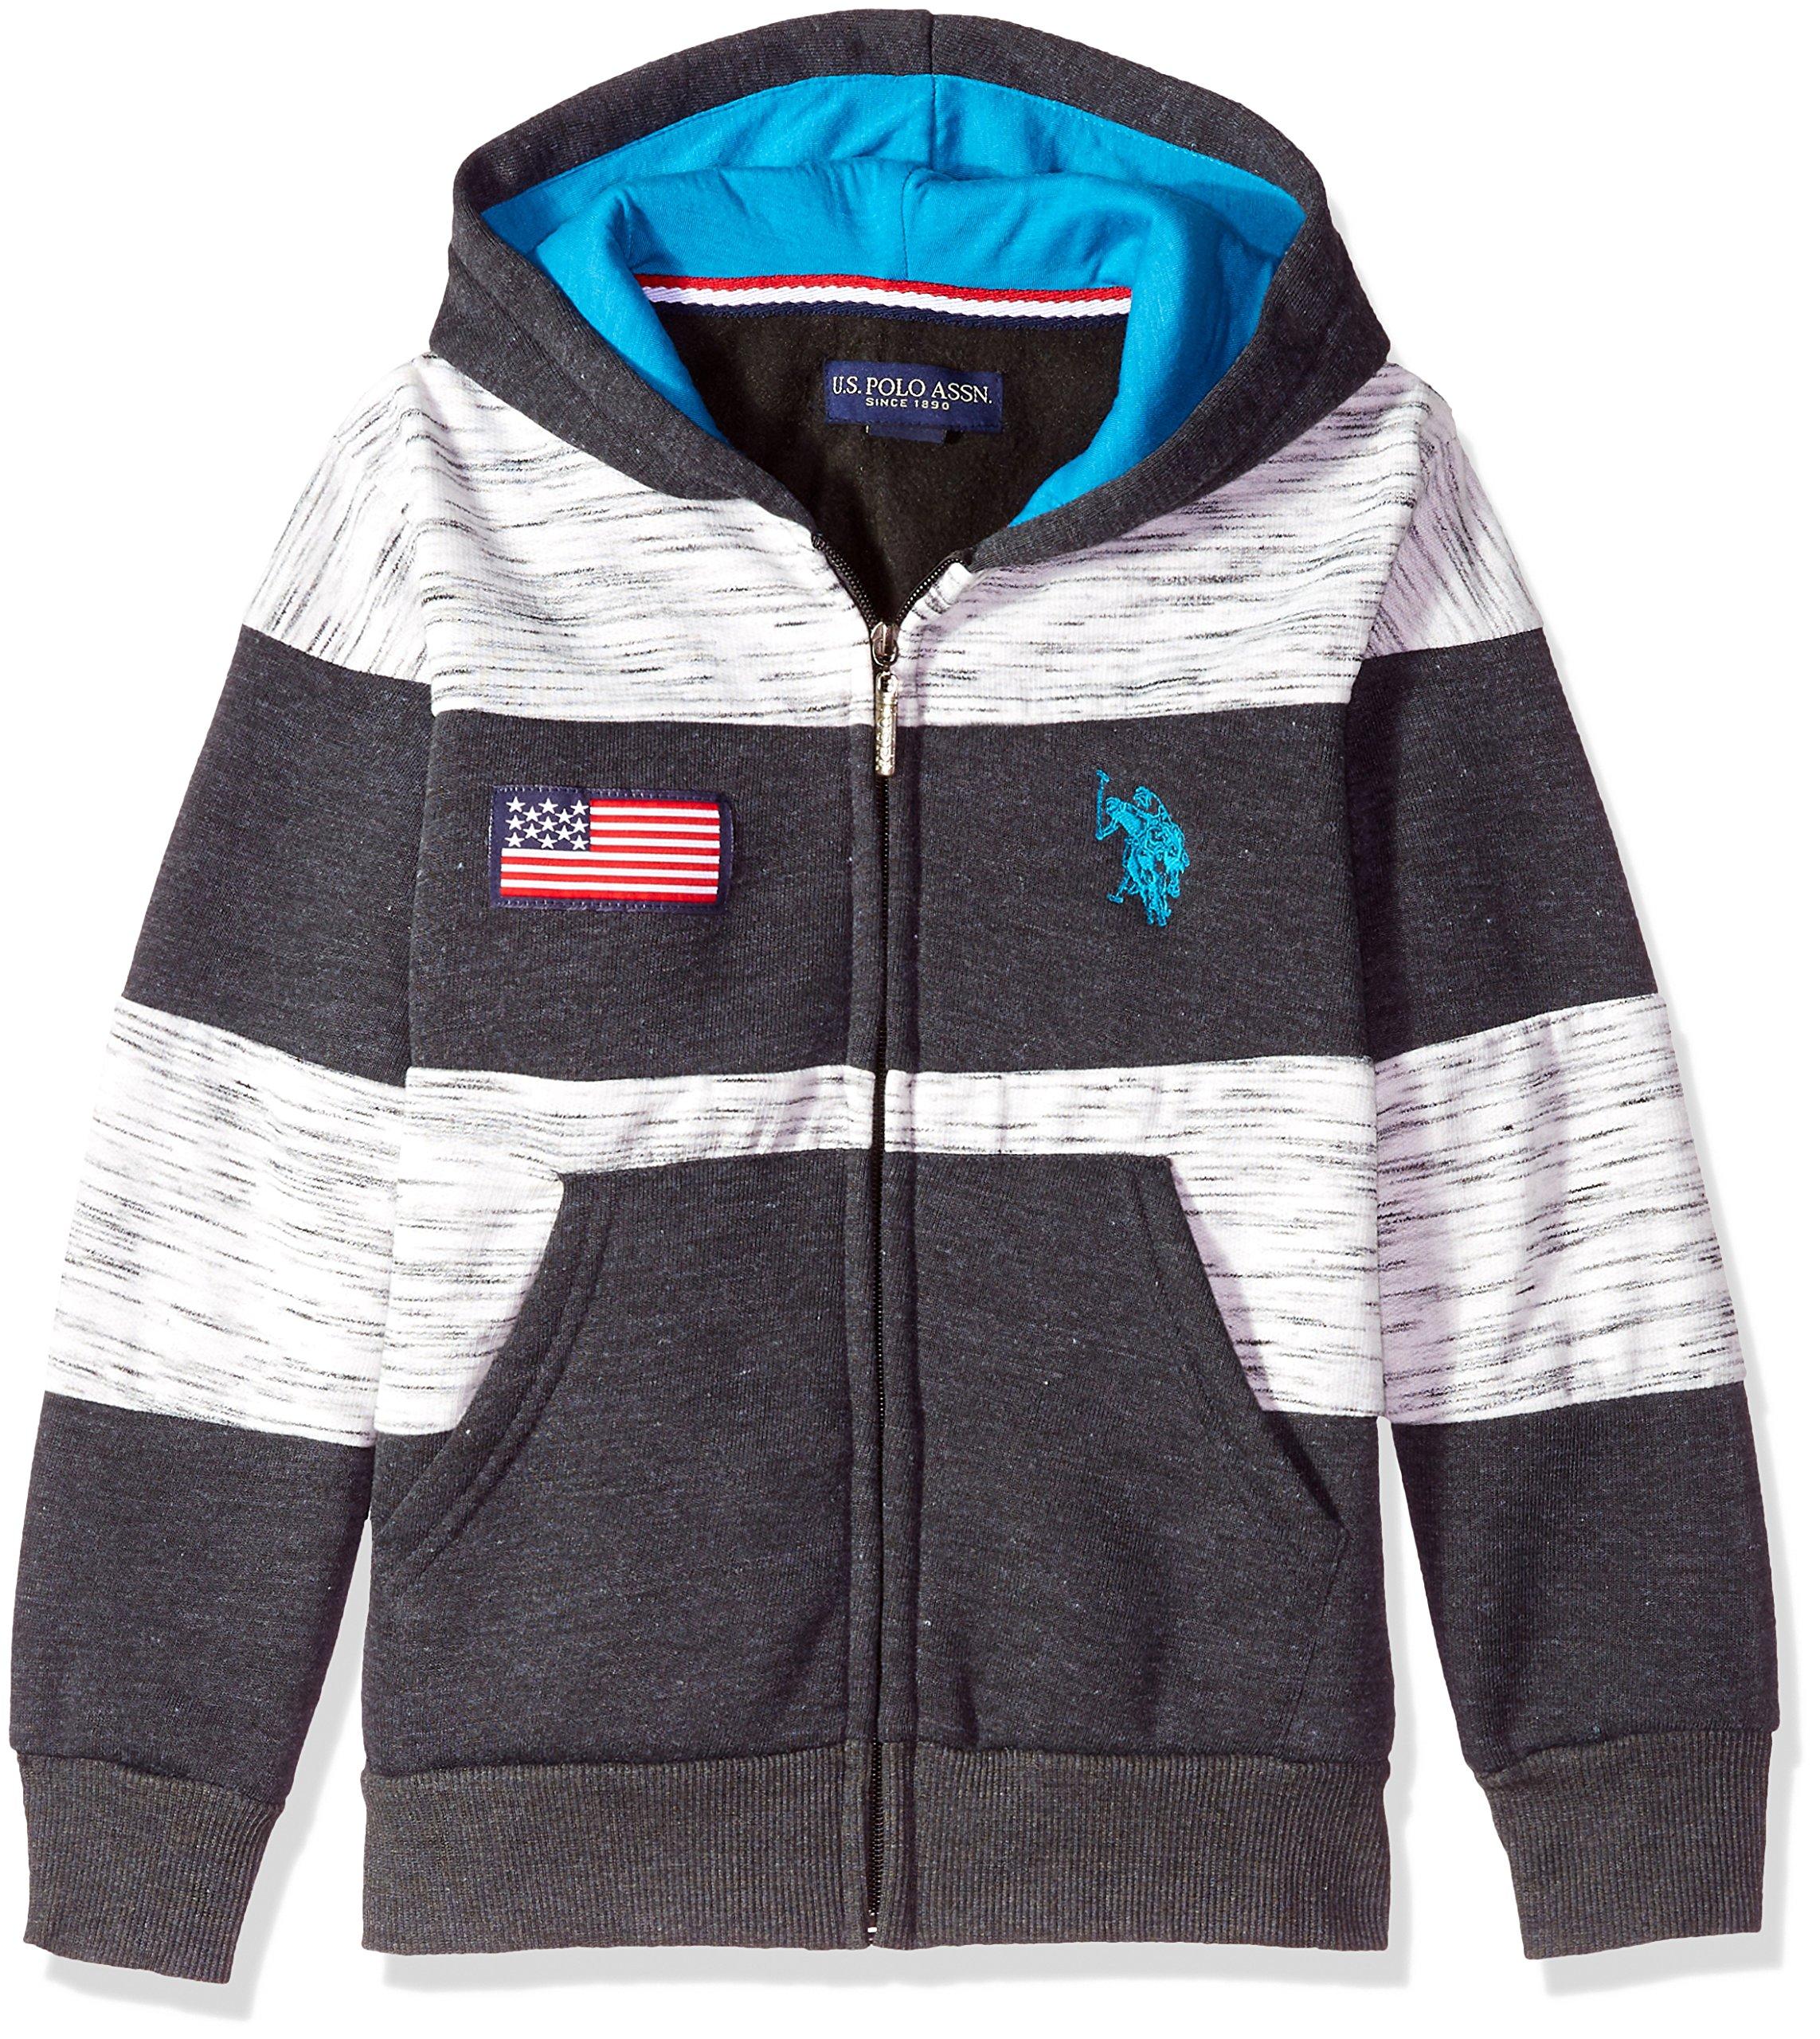 U.S. Polo Assn. Little Boys' Hooded Zip or Snap Fleece Jacket, American Flag Chest Dark Heather Gray 4